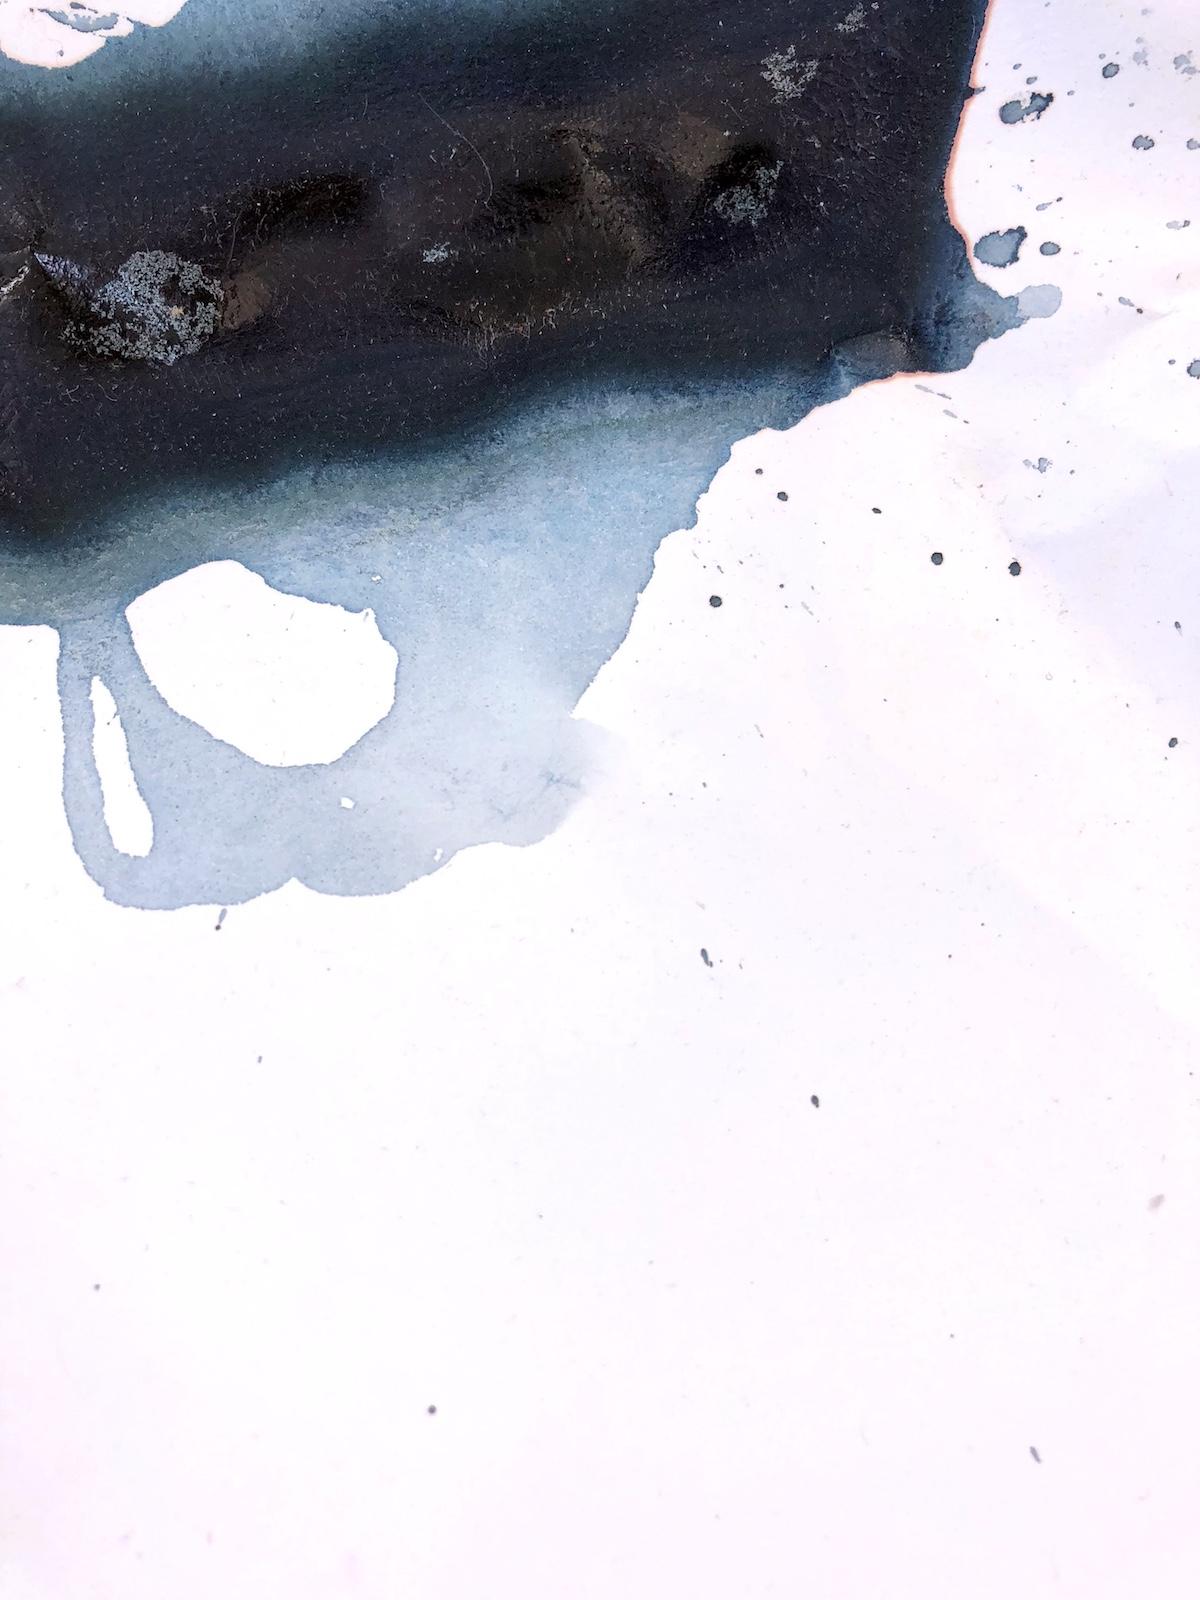 Recreating Zealandia, no. 2 (detail)